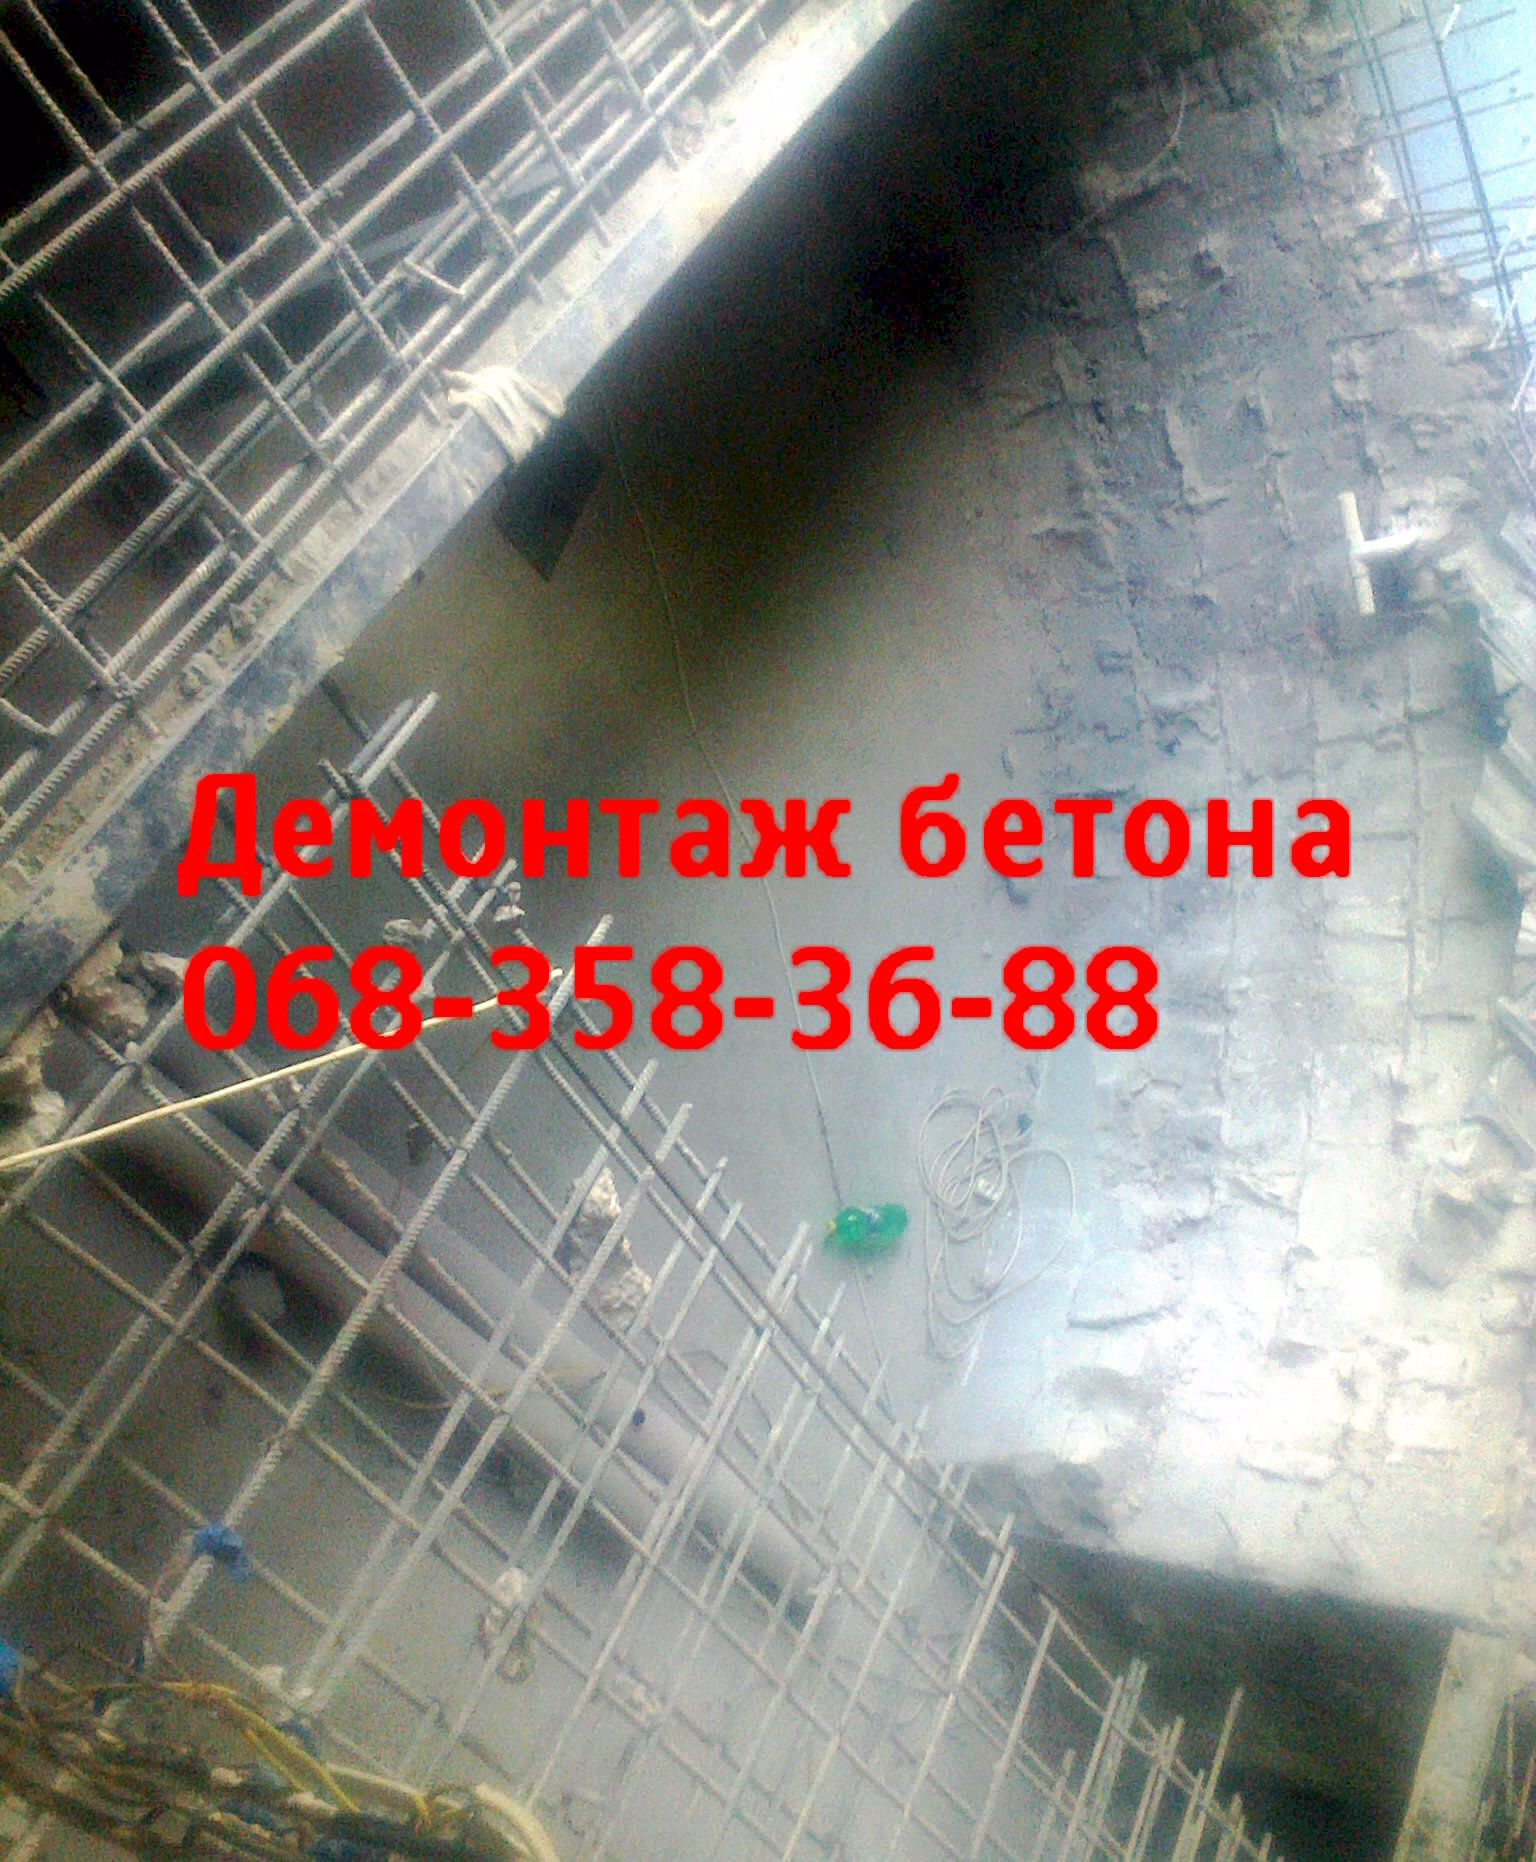 Нажмите на изображение для увеличения Название: Фото0665.jpg Просмотров: 10 Размер:510.5 Кб ID:595171